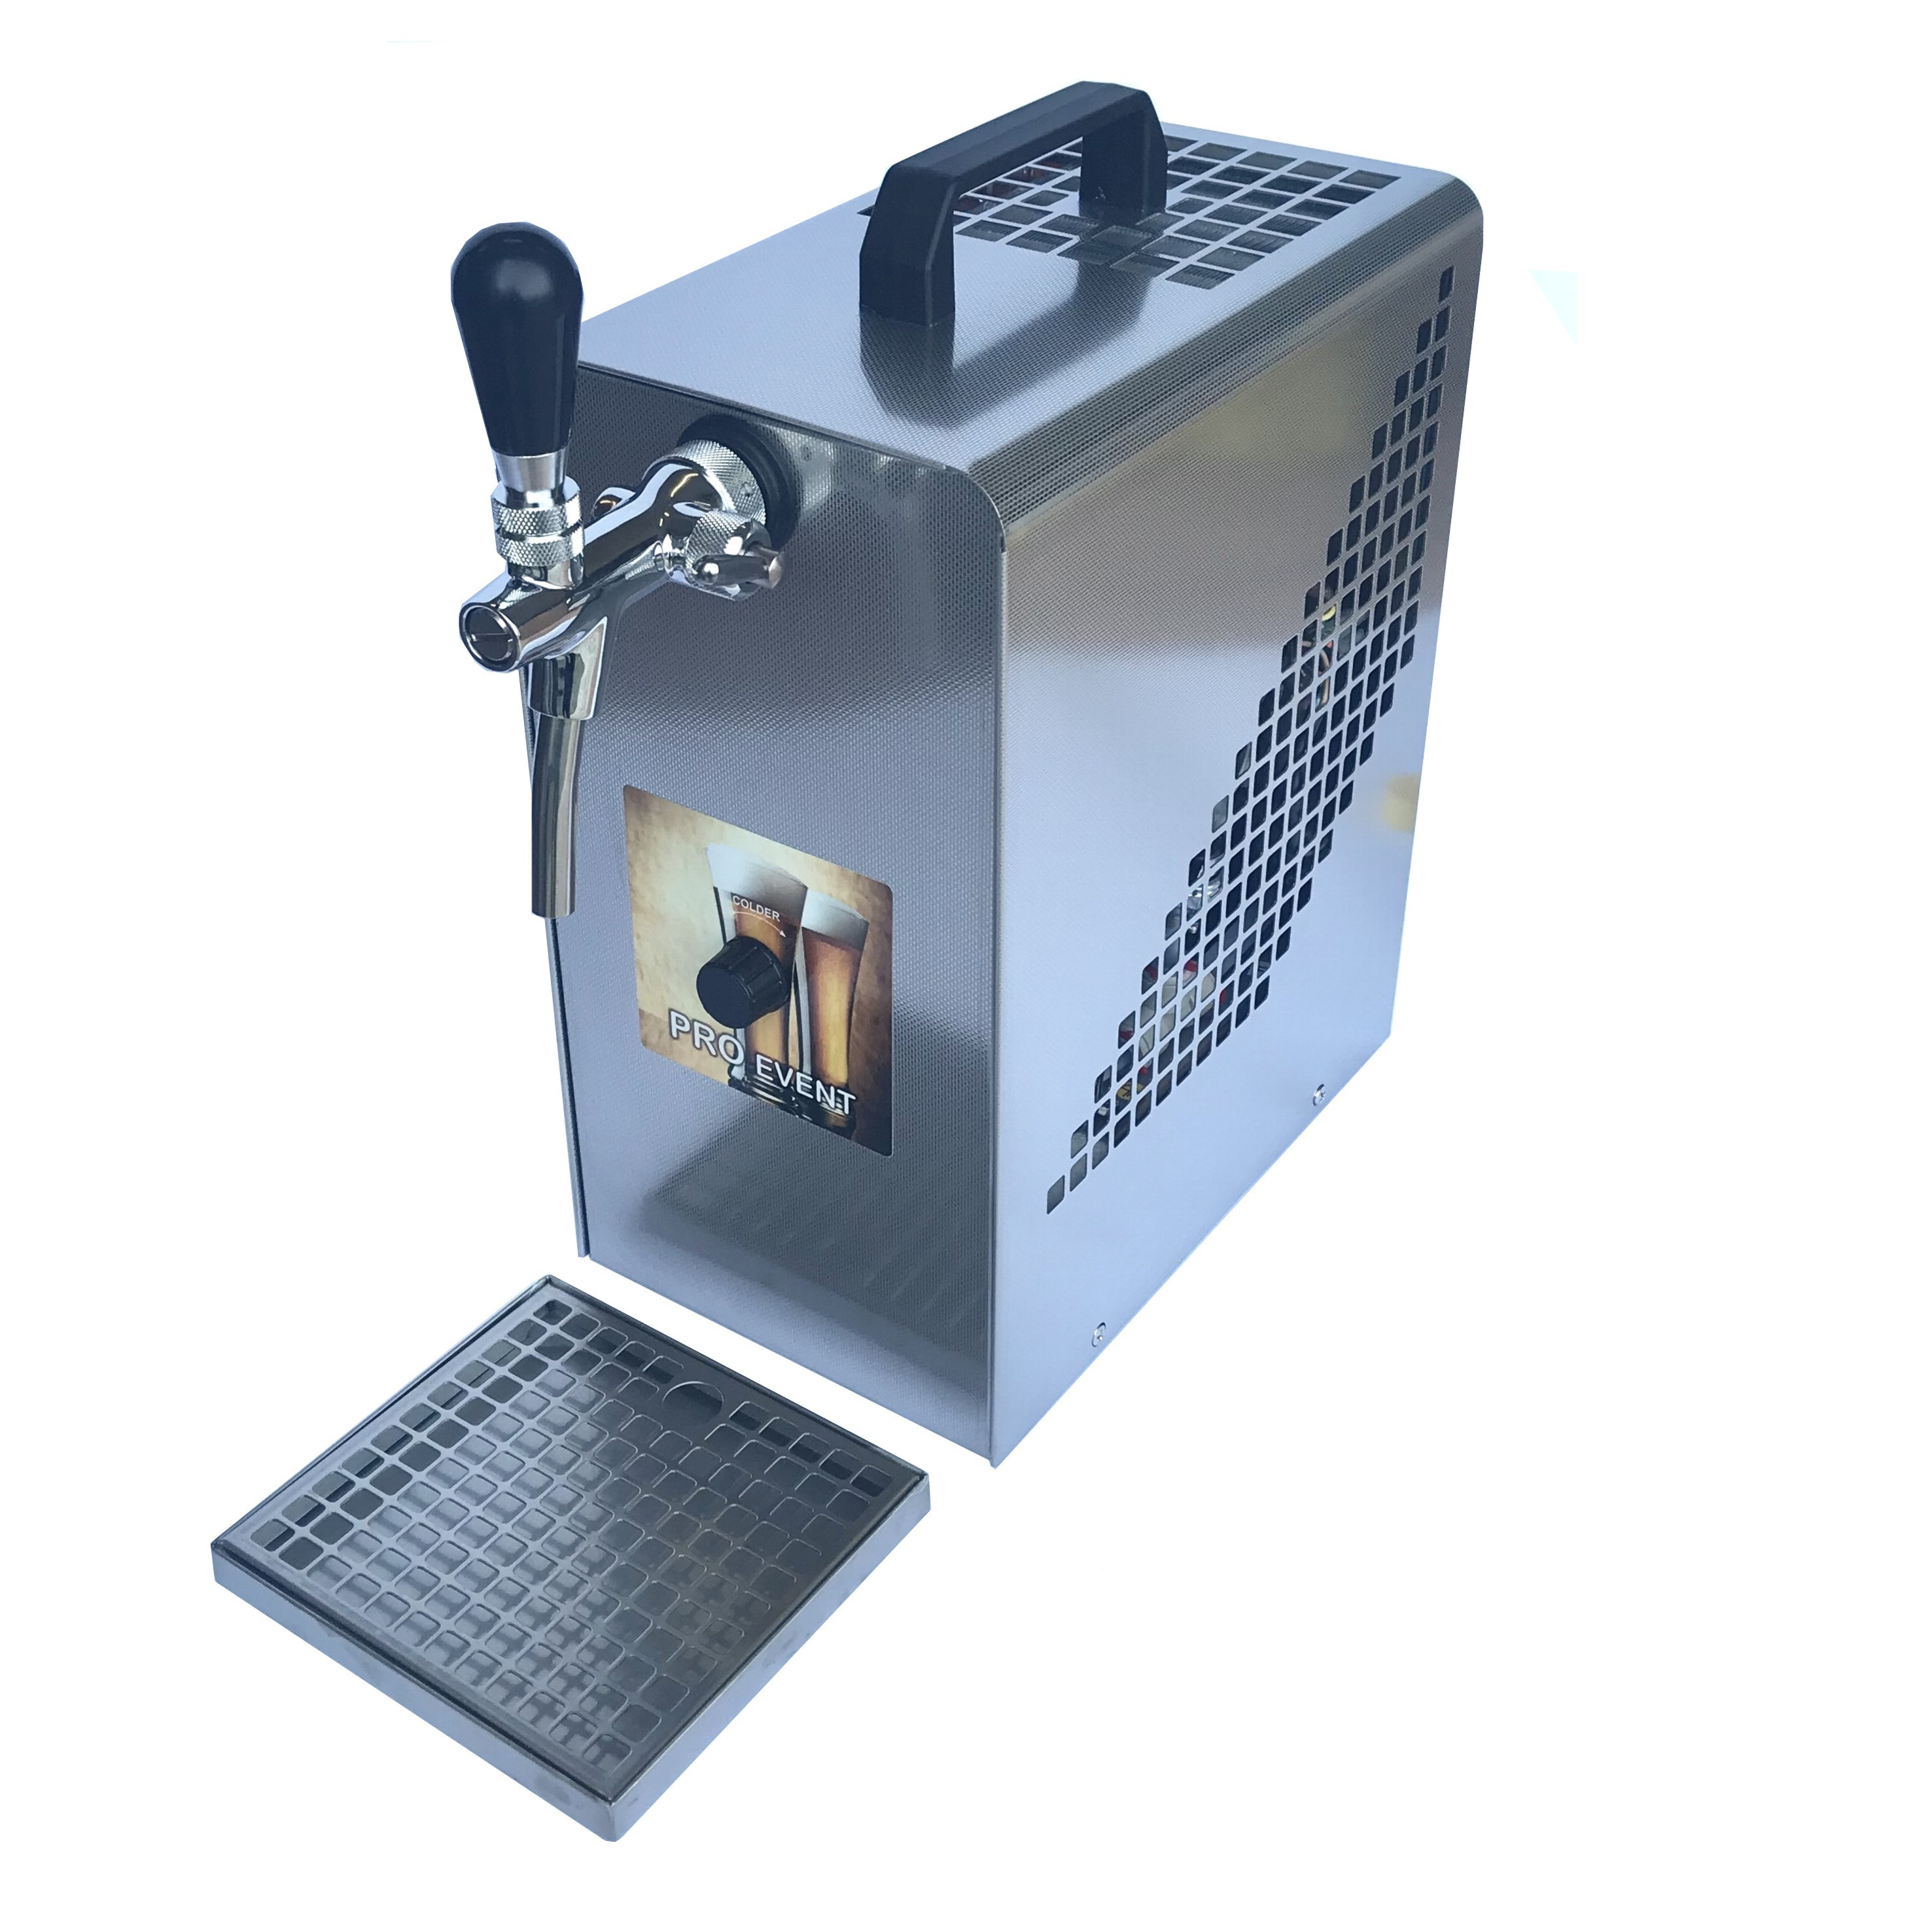 bierk hler zapfanlage bierkoffer 1 leitig mit integr luftkompressor. Black Bedroom Furniture Sets. Home Design Ideas